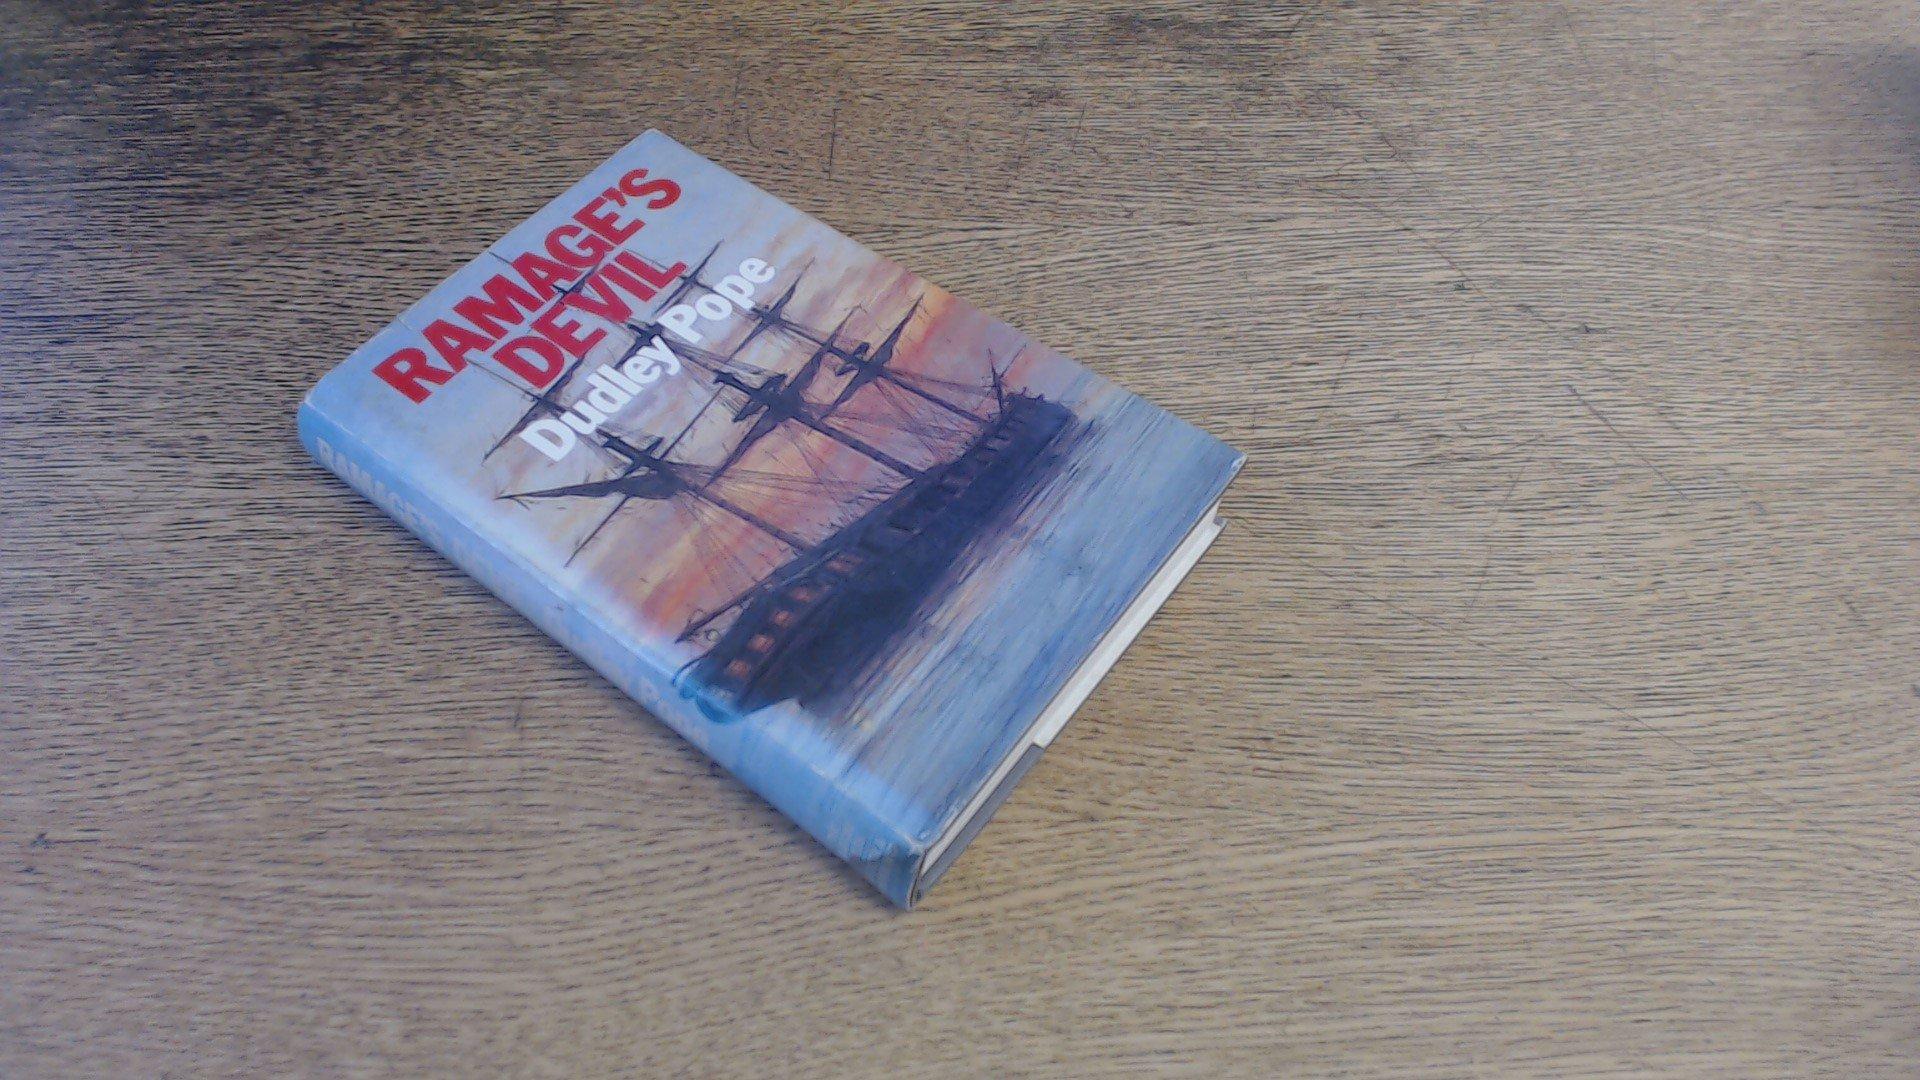 Ramage's Devil (Alison Press Books)